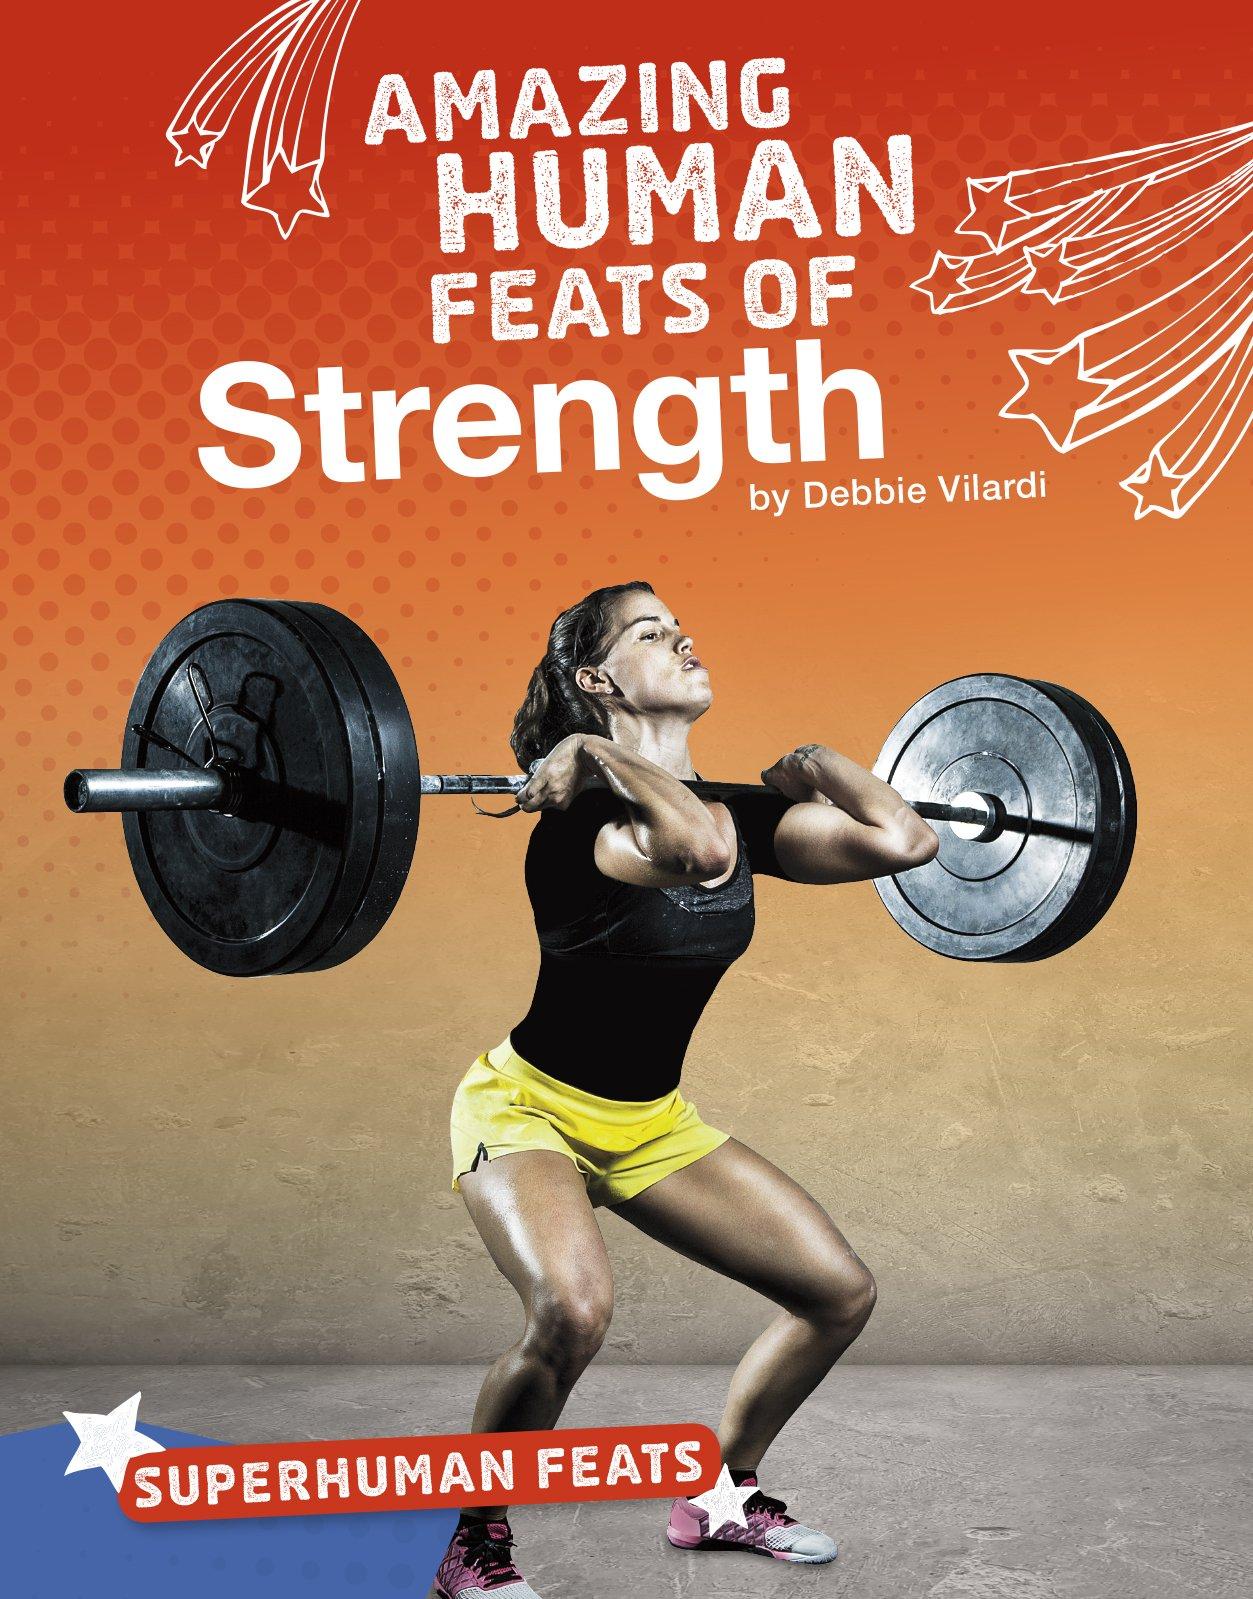 Amazing Human Feats of Strength (Superhuman Feats)